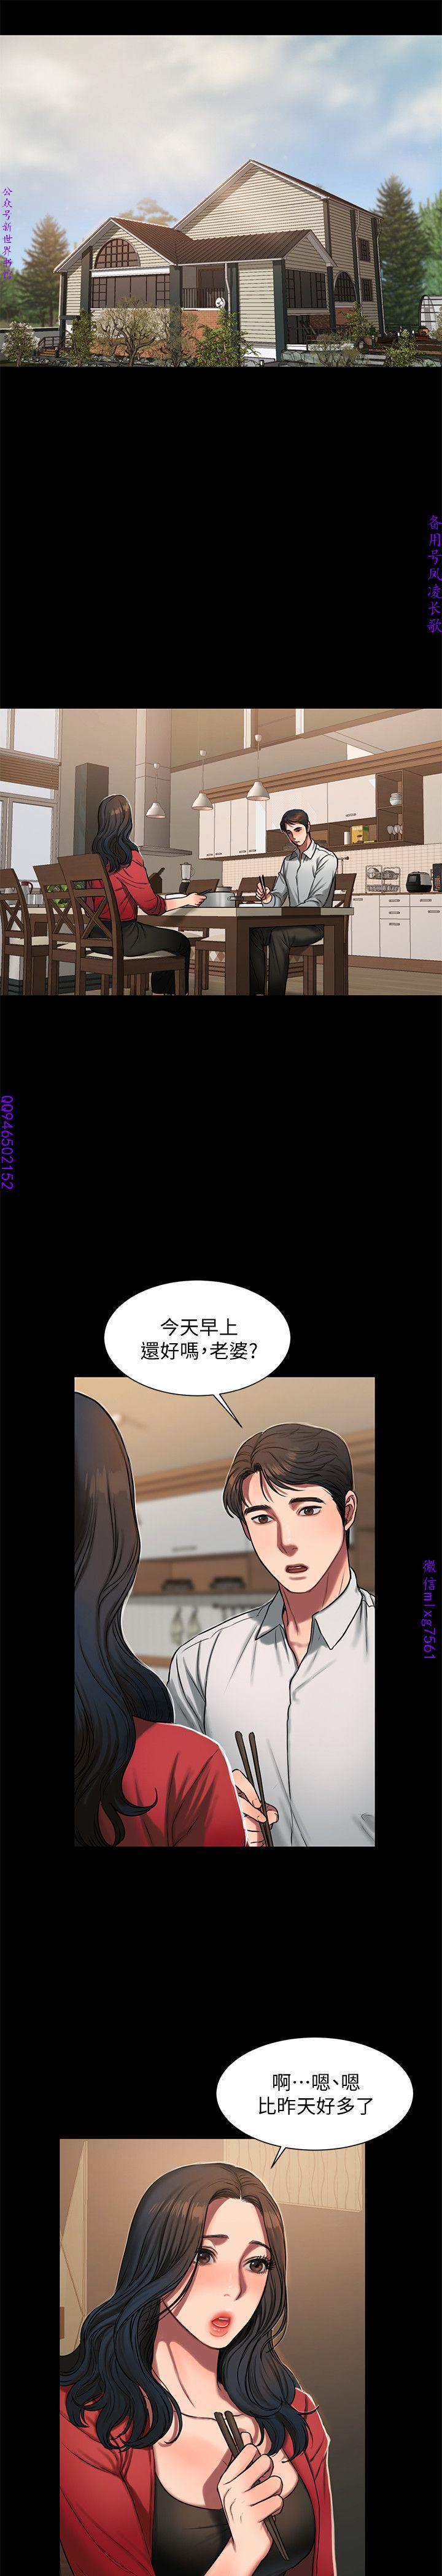 Run away 1-10【中文】 172